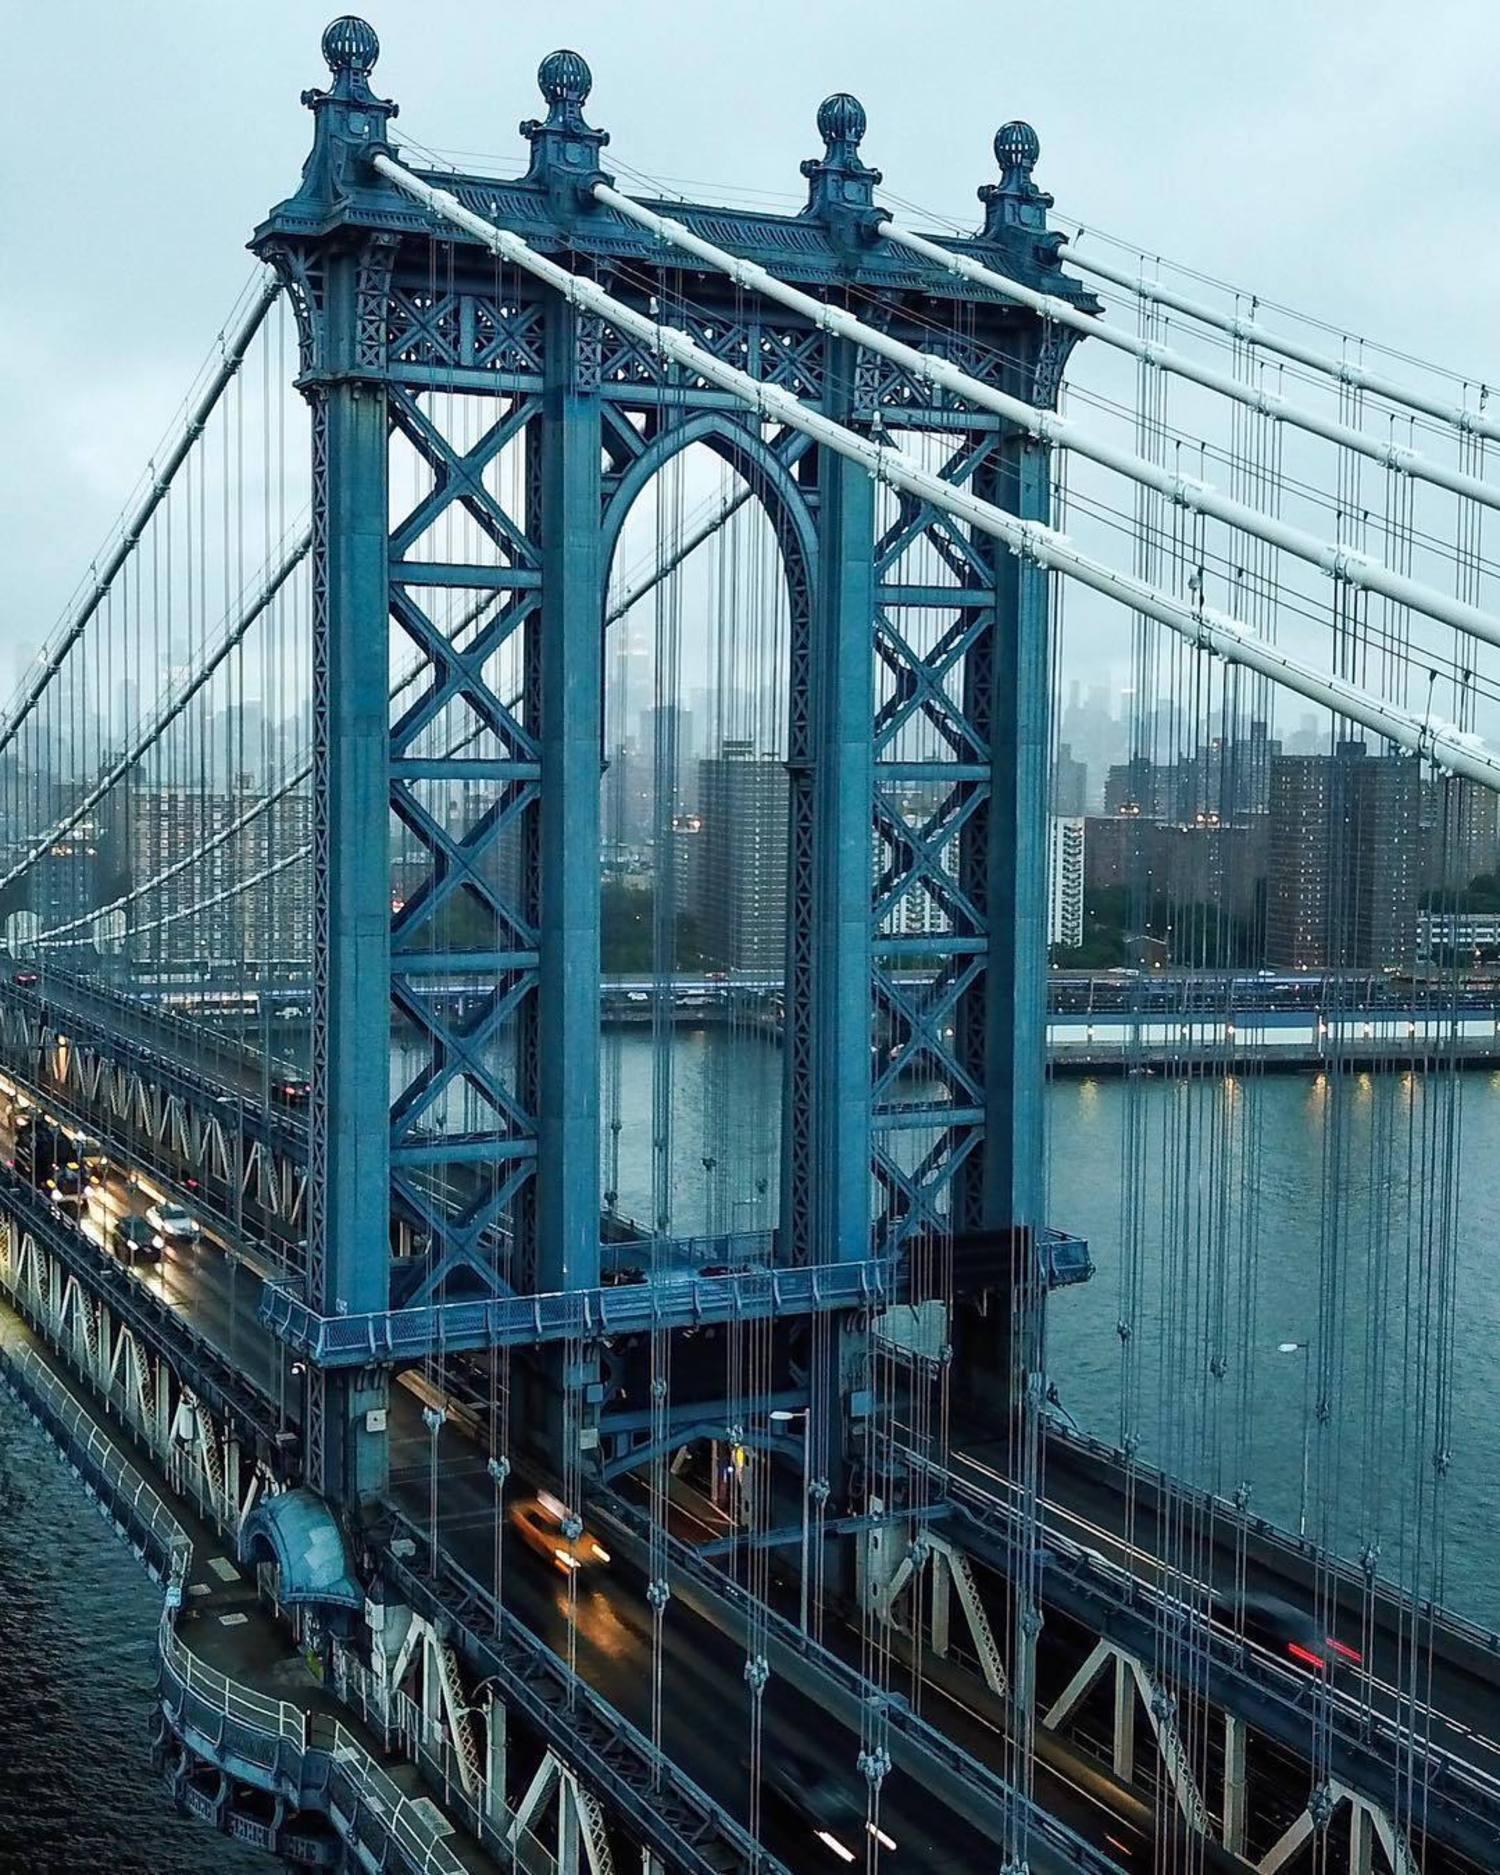 Manhattan Bridge, New York, New York. Photo via @ctg125 #viewingnyc #newyork #newyorkcity #nyc #manhattanbridge